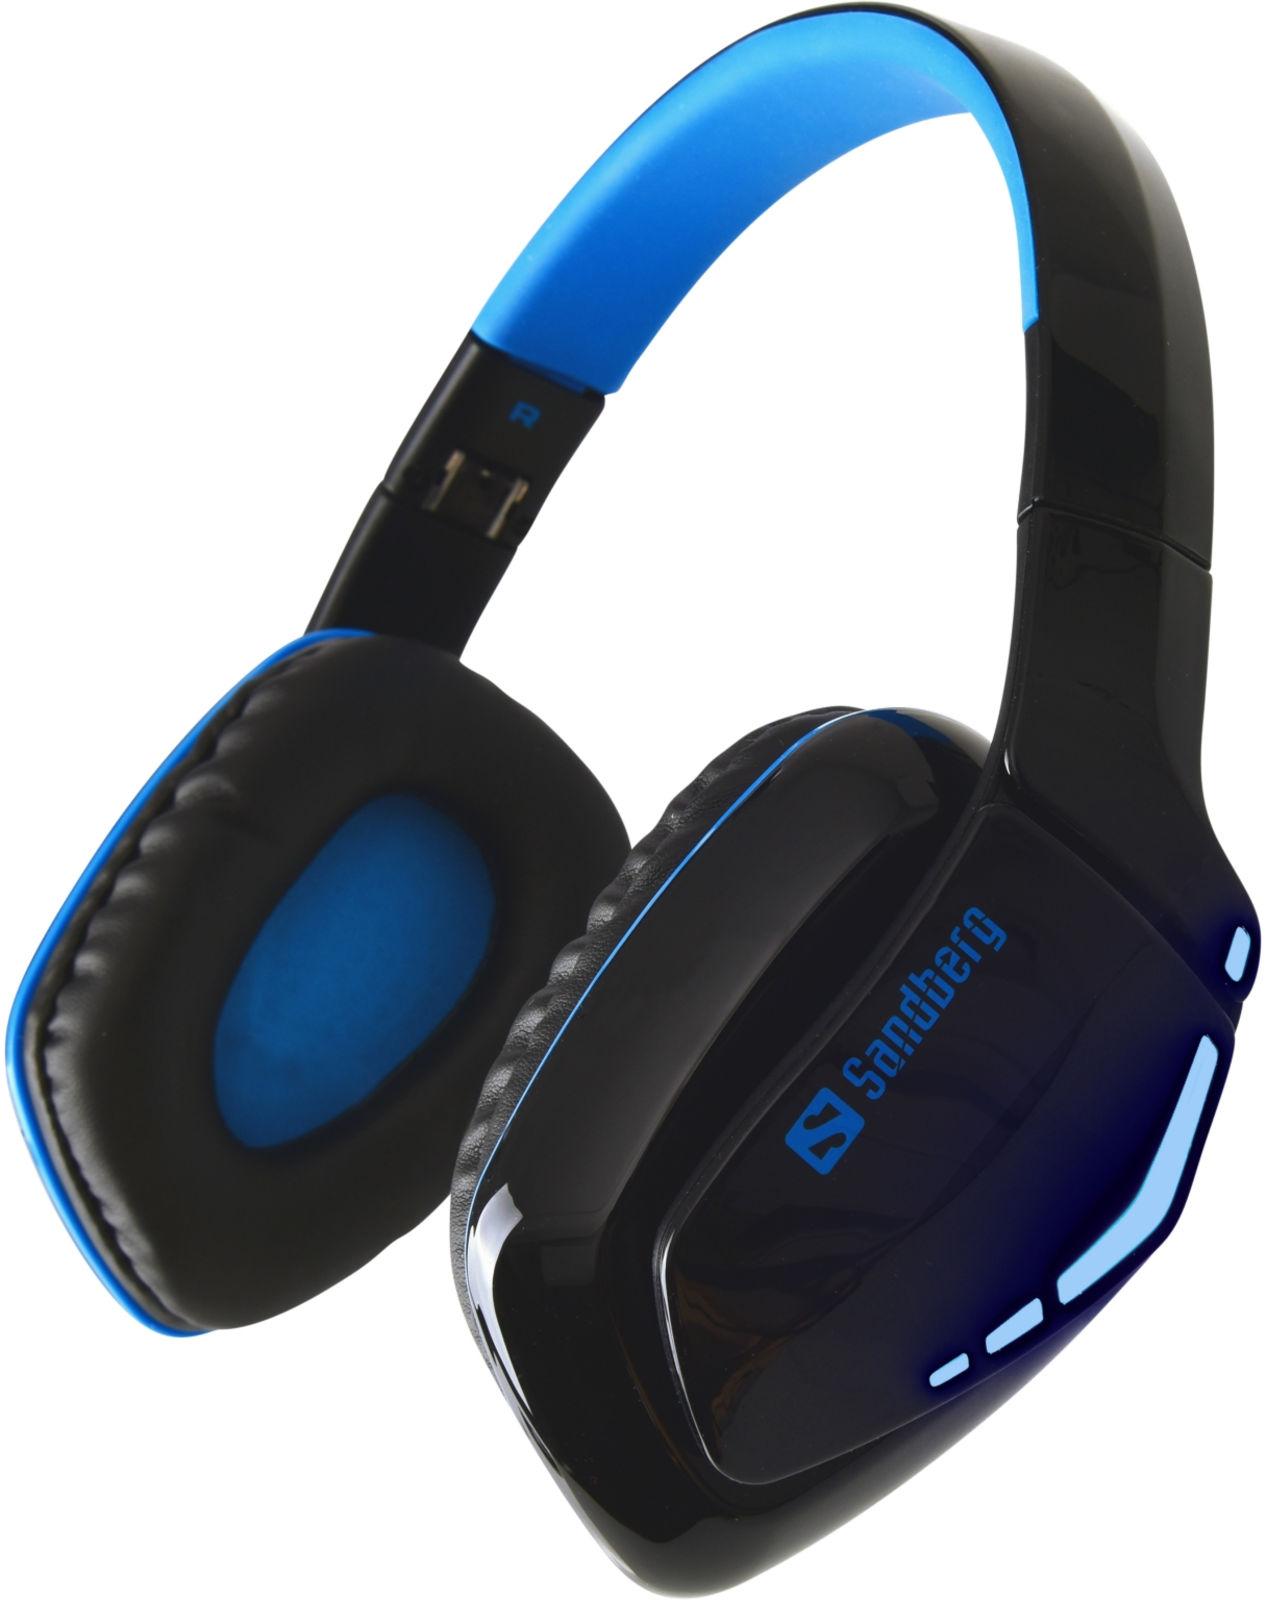 Bluetooth Stereo Headset Pro 2